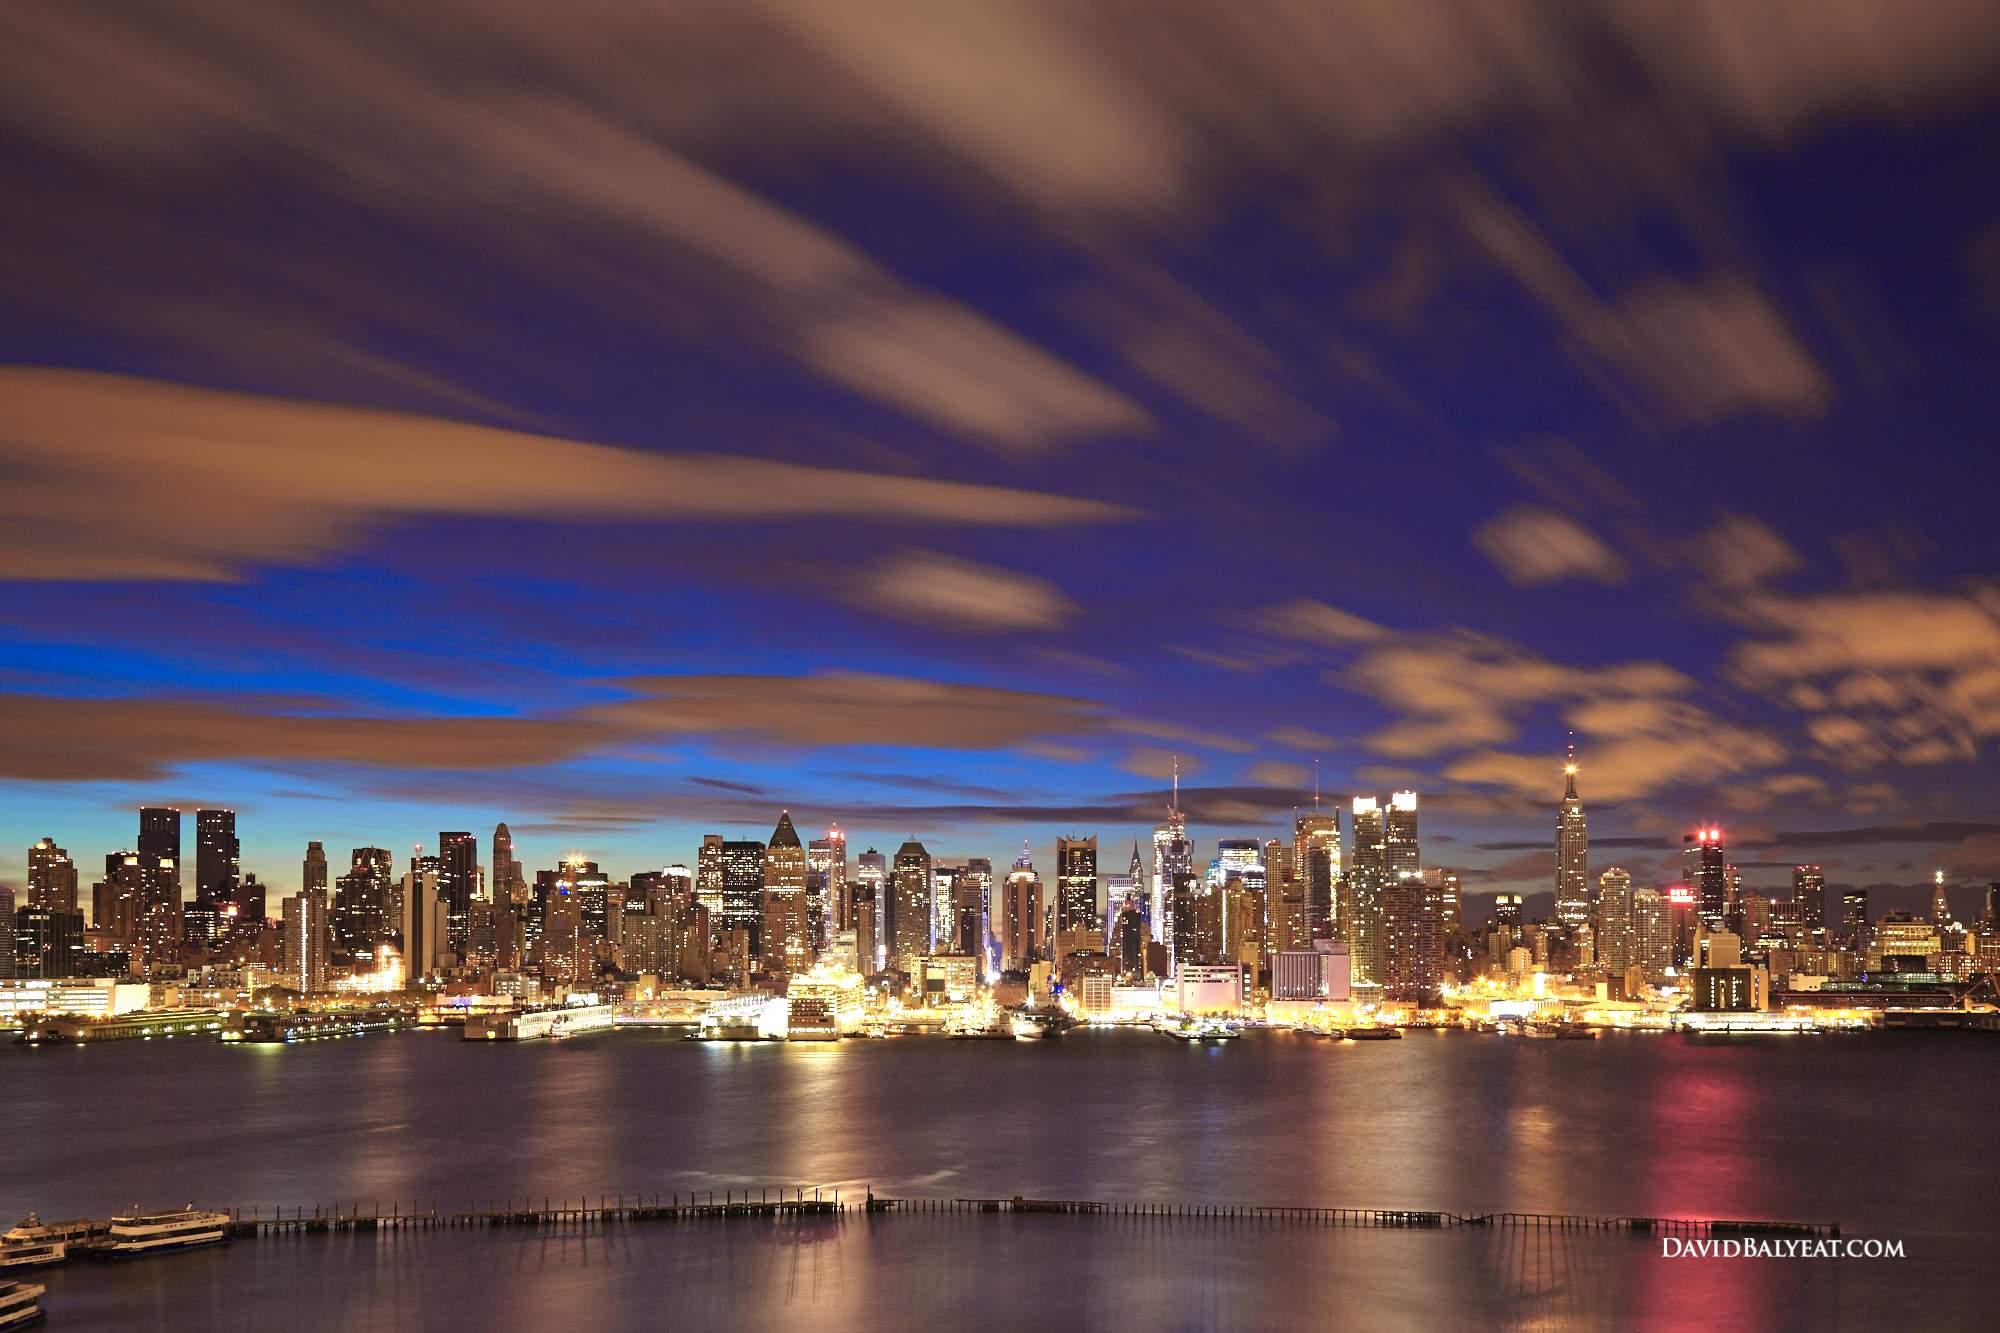 Seattle Washington In Fall City Night Wallpaper Midtown Sunrise New York City David Balyeat Photography